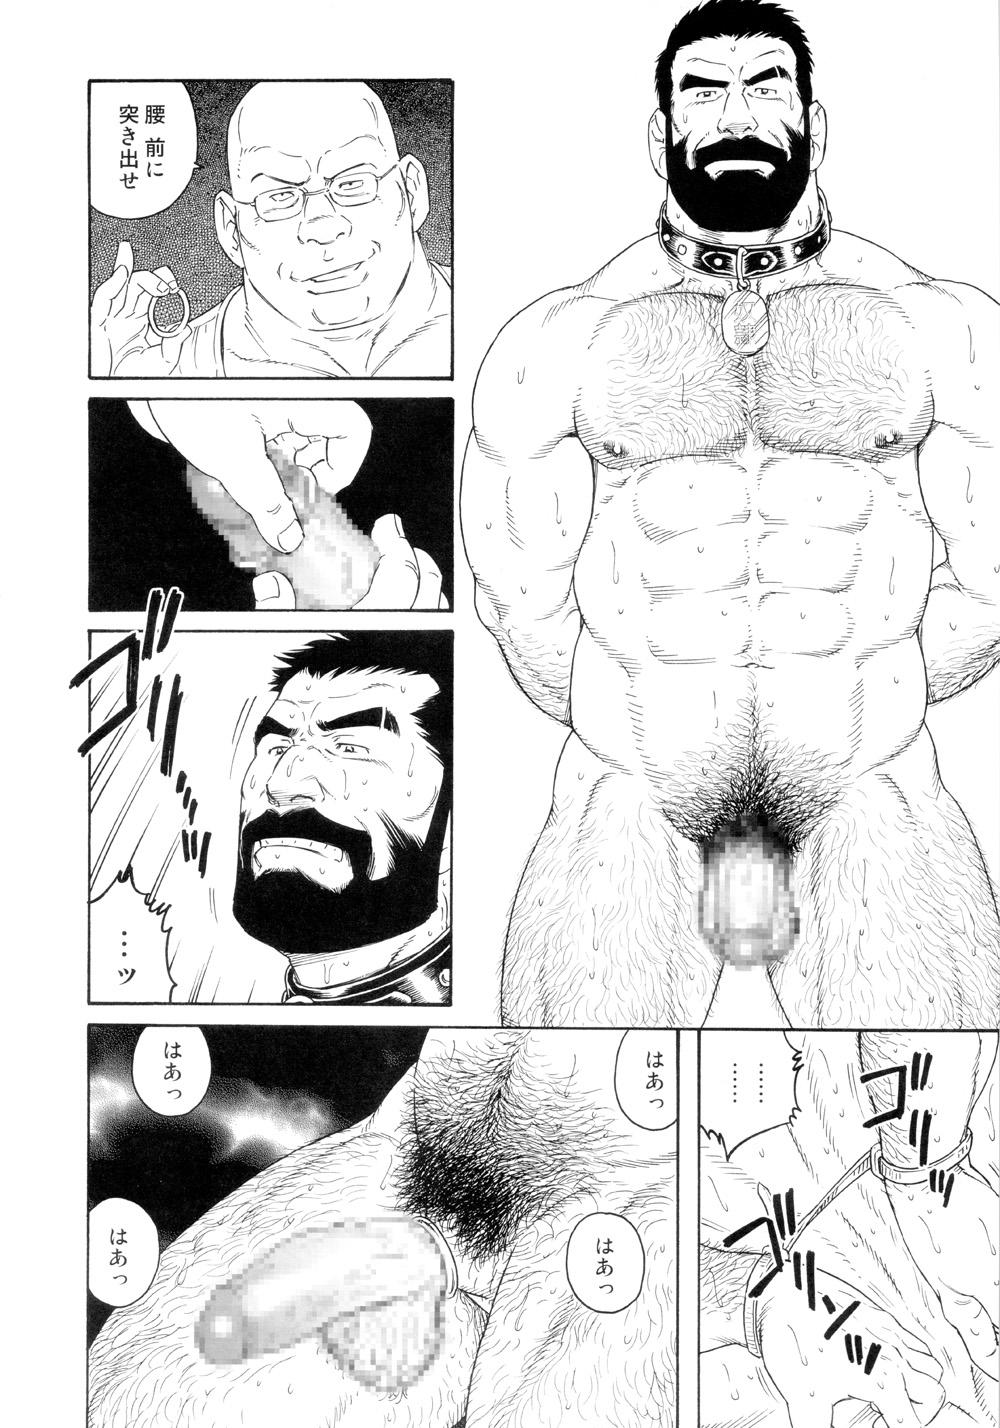 Genryu Chapter 1 7